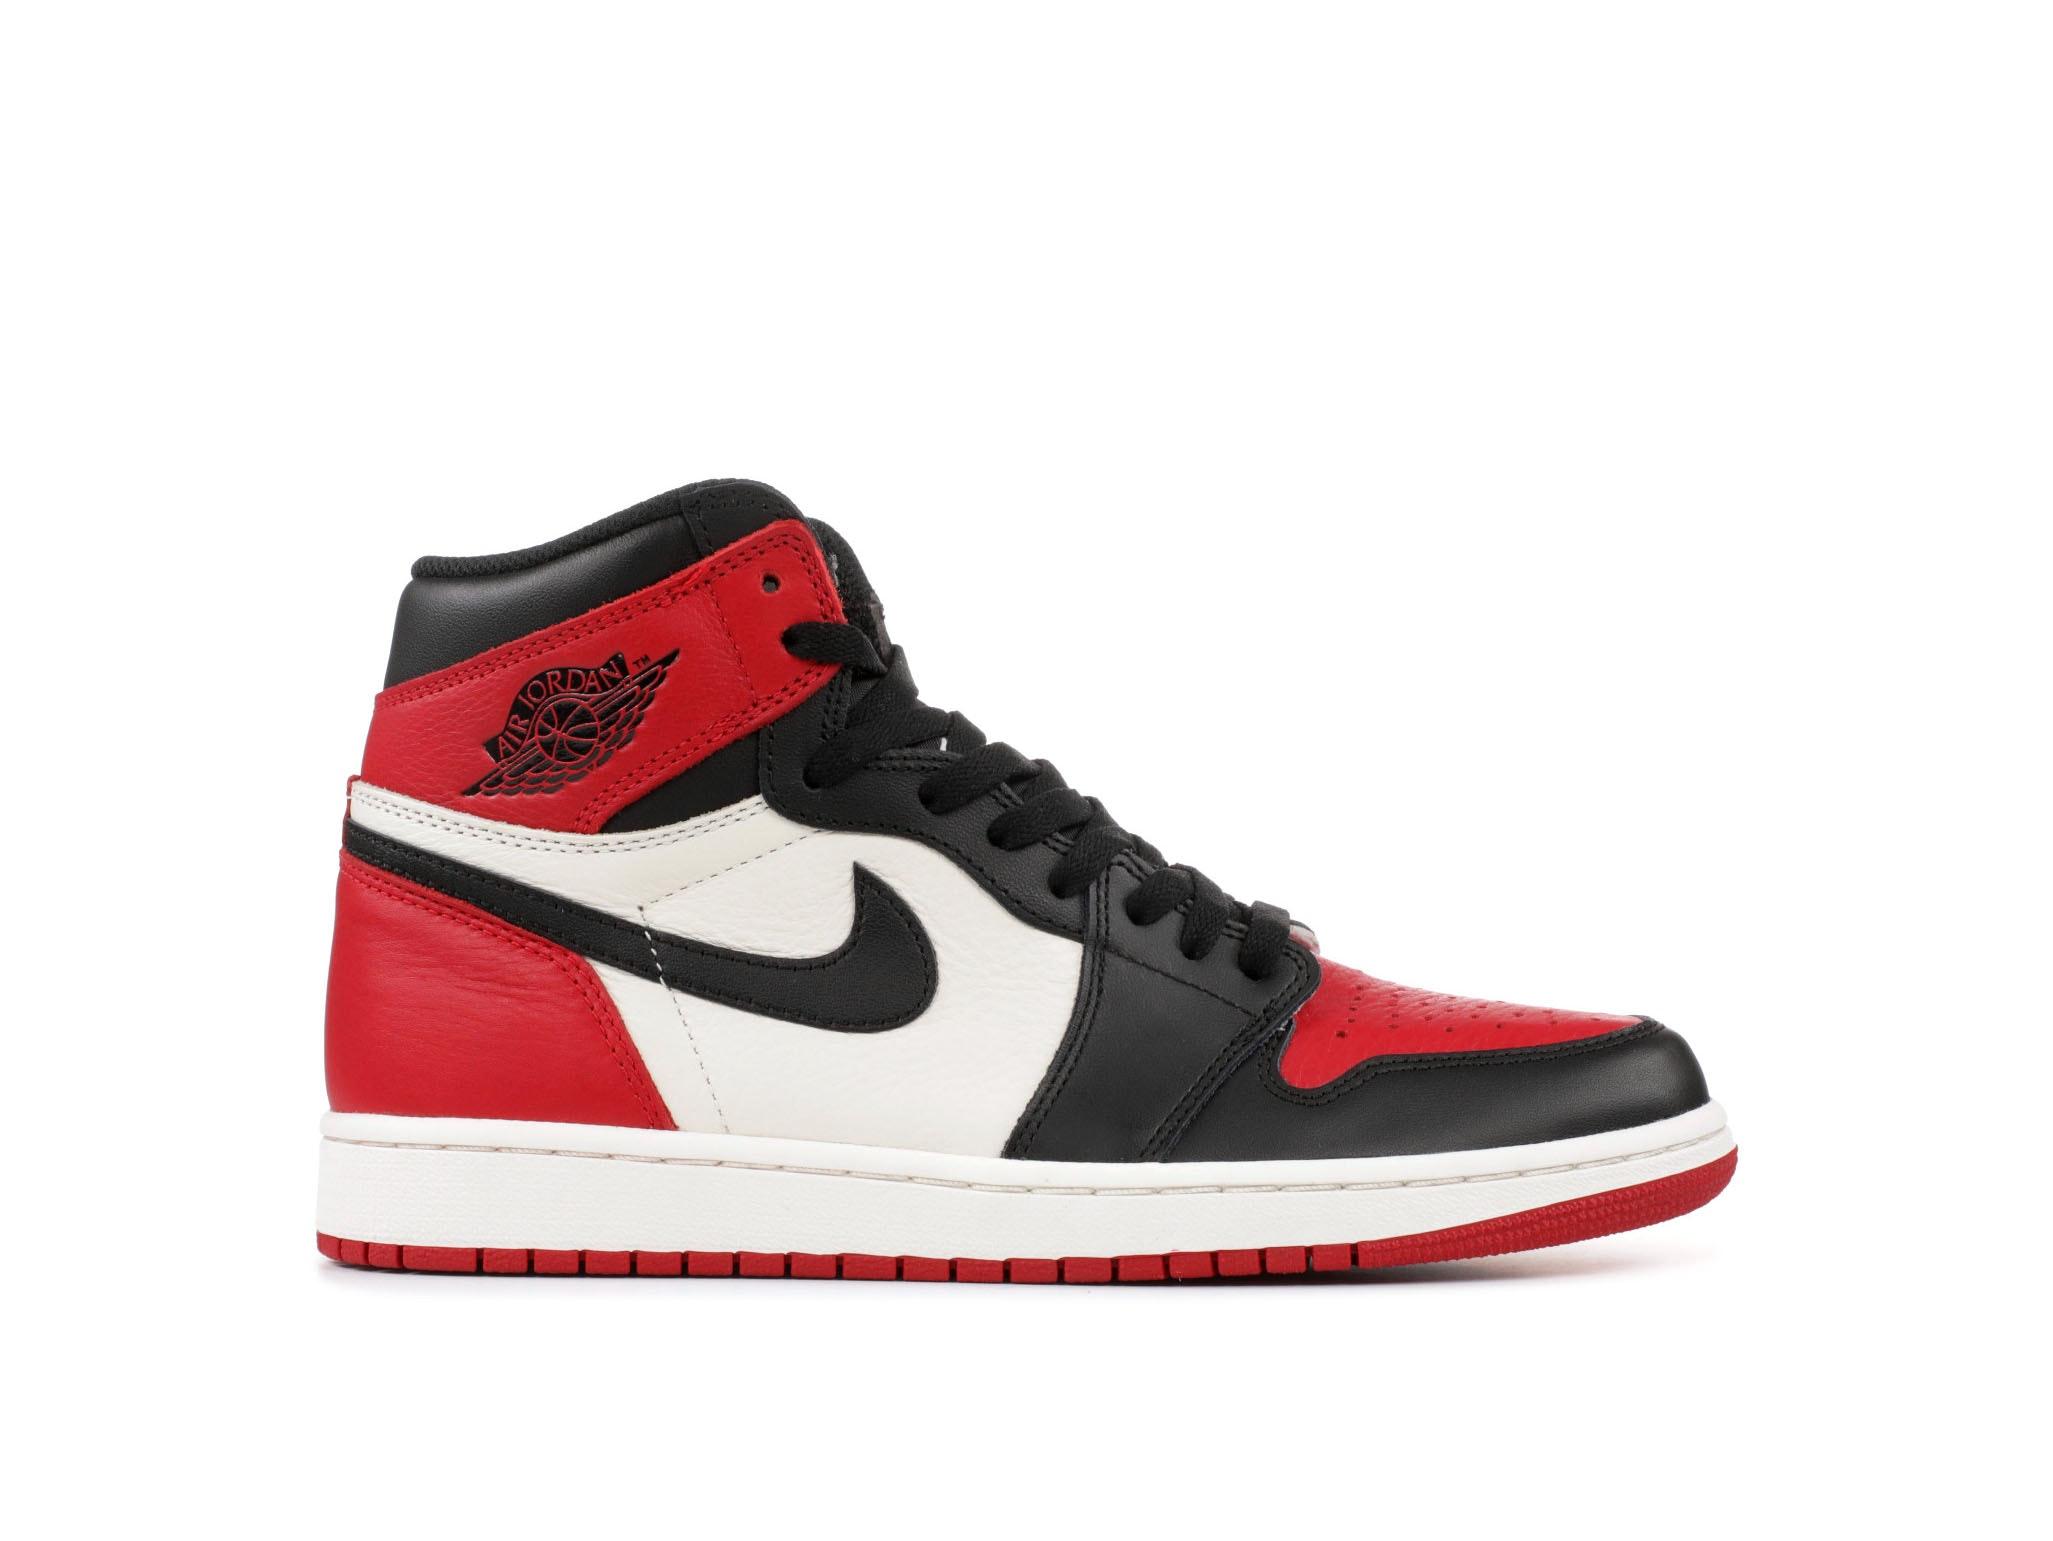 87f60ae3eb25f9 Shop Air Jordan 1 Retro High OG Bred Toe Online